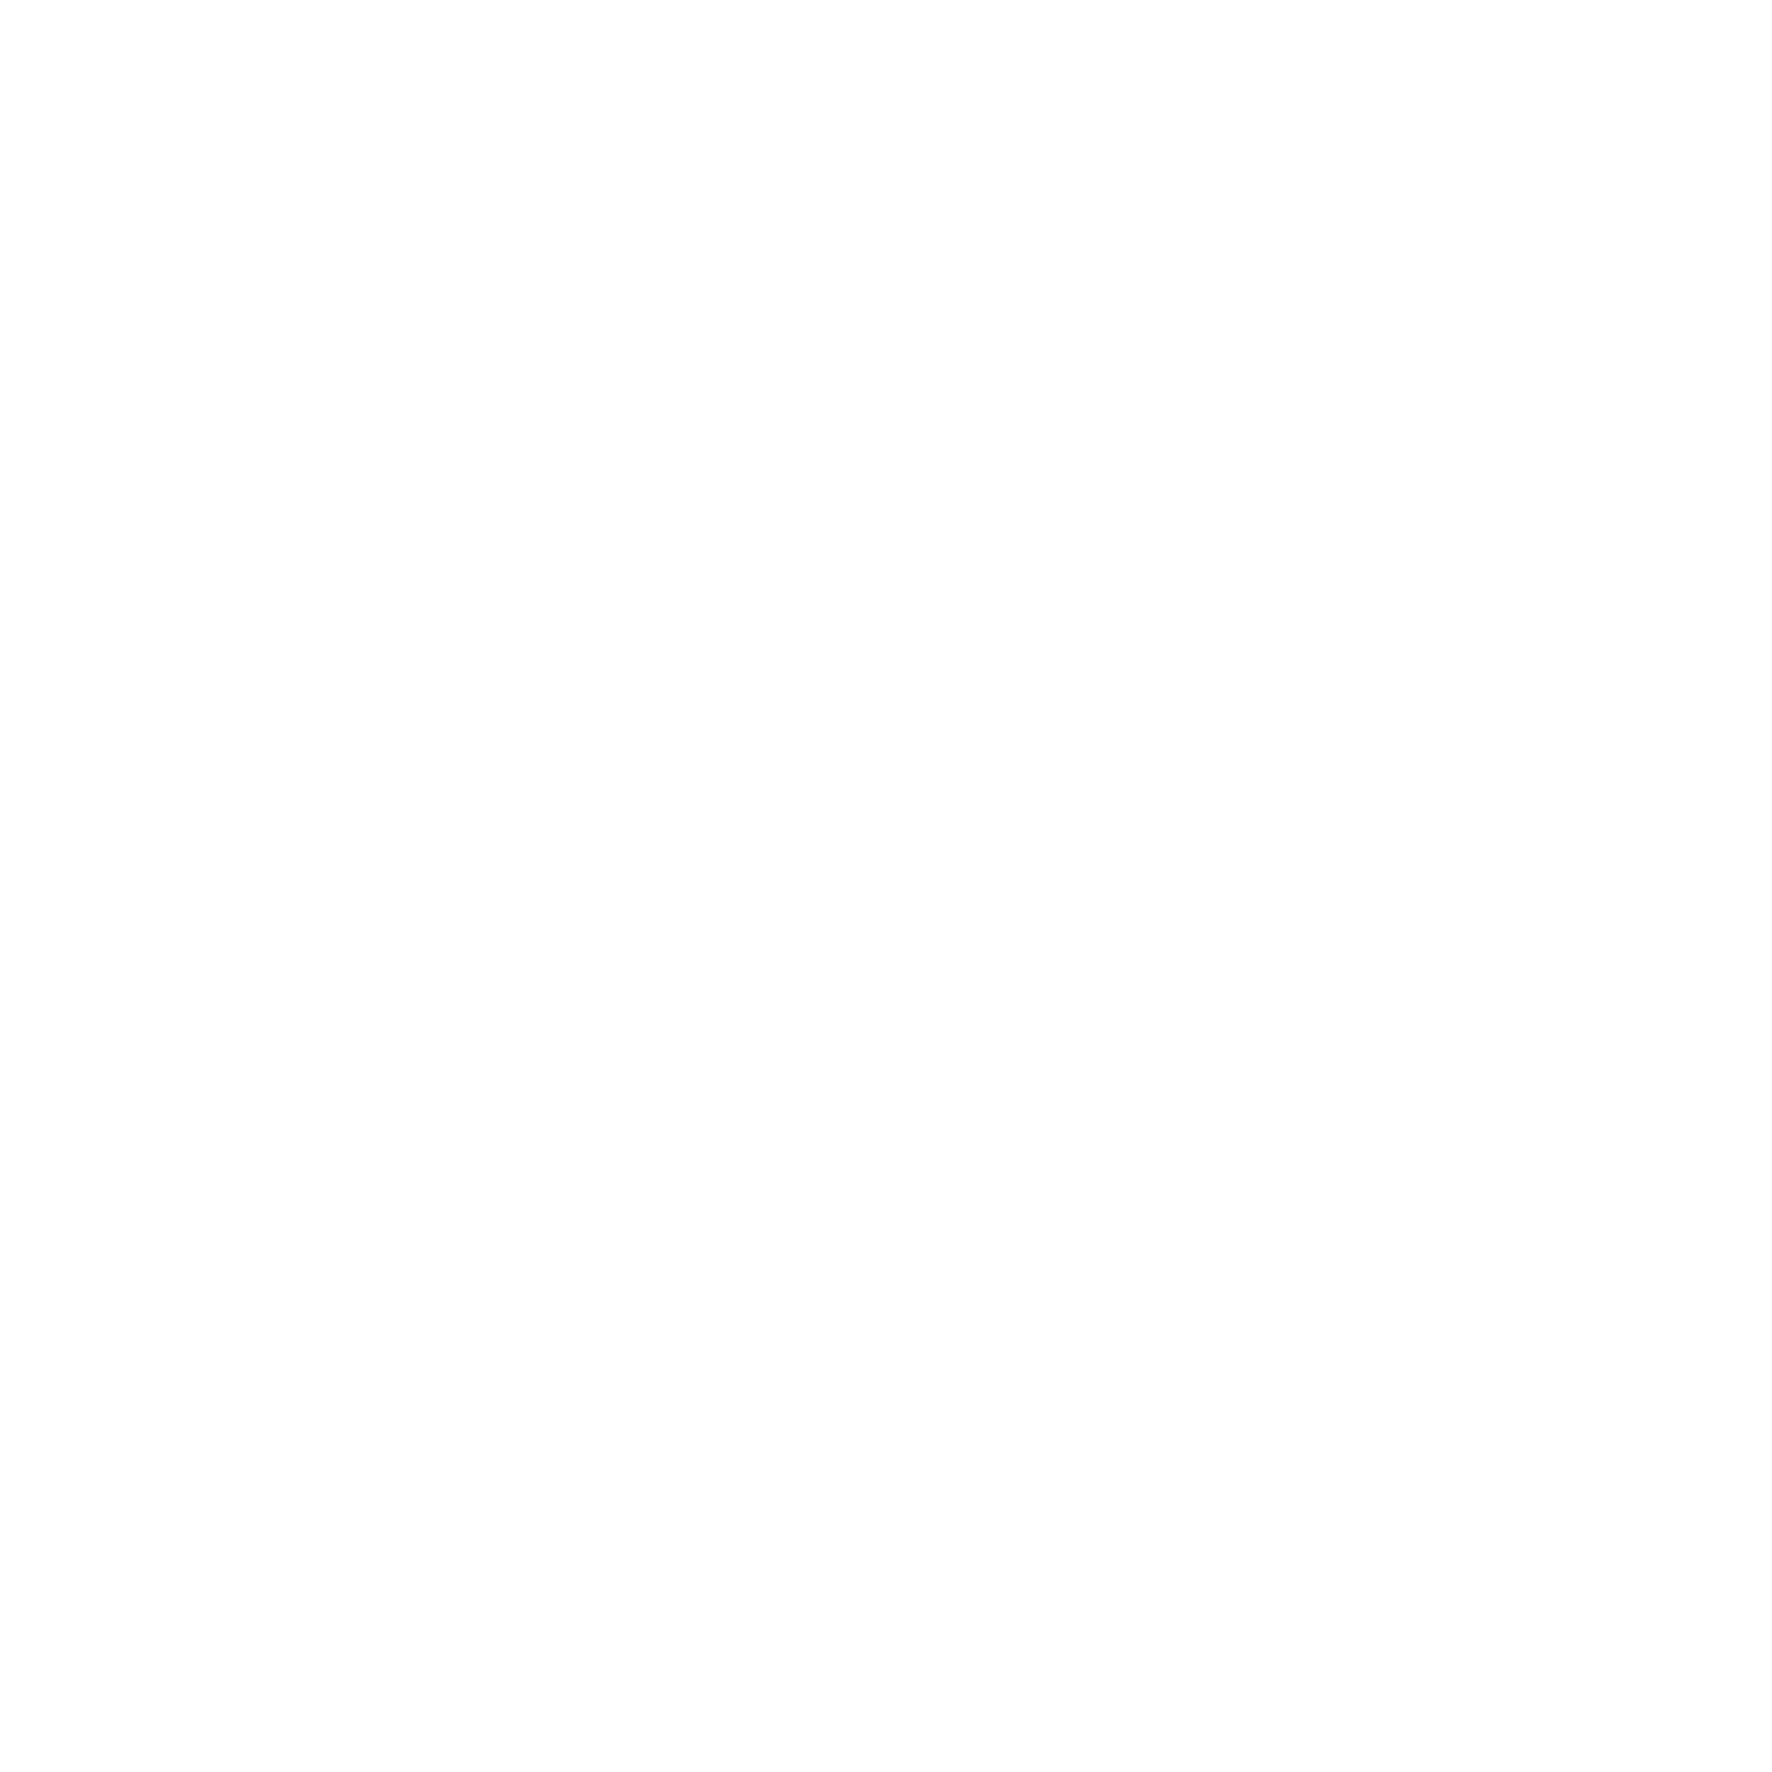 BeeVrac